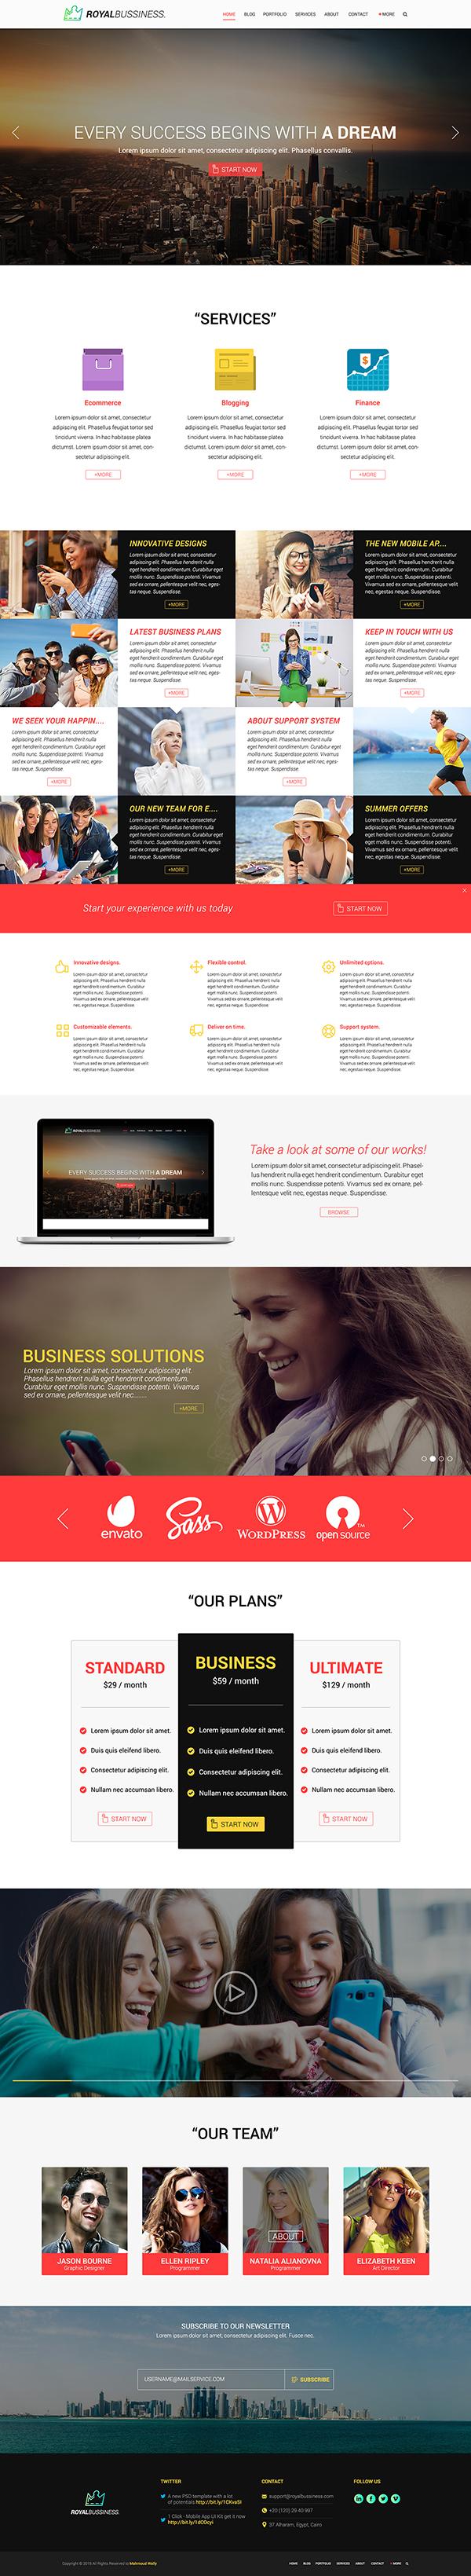 07 Royal Business - FREE Multipurpose PSD Template